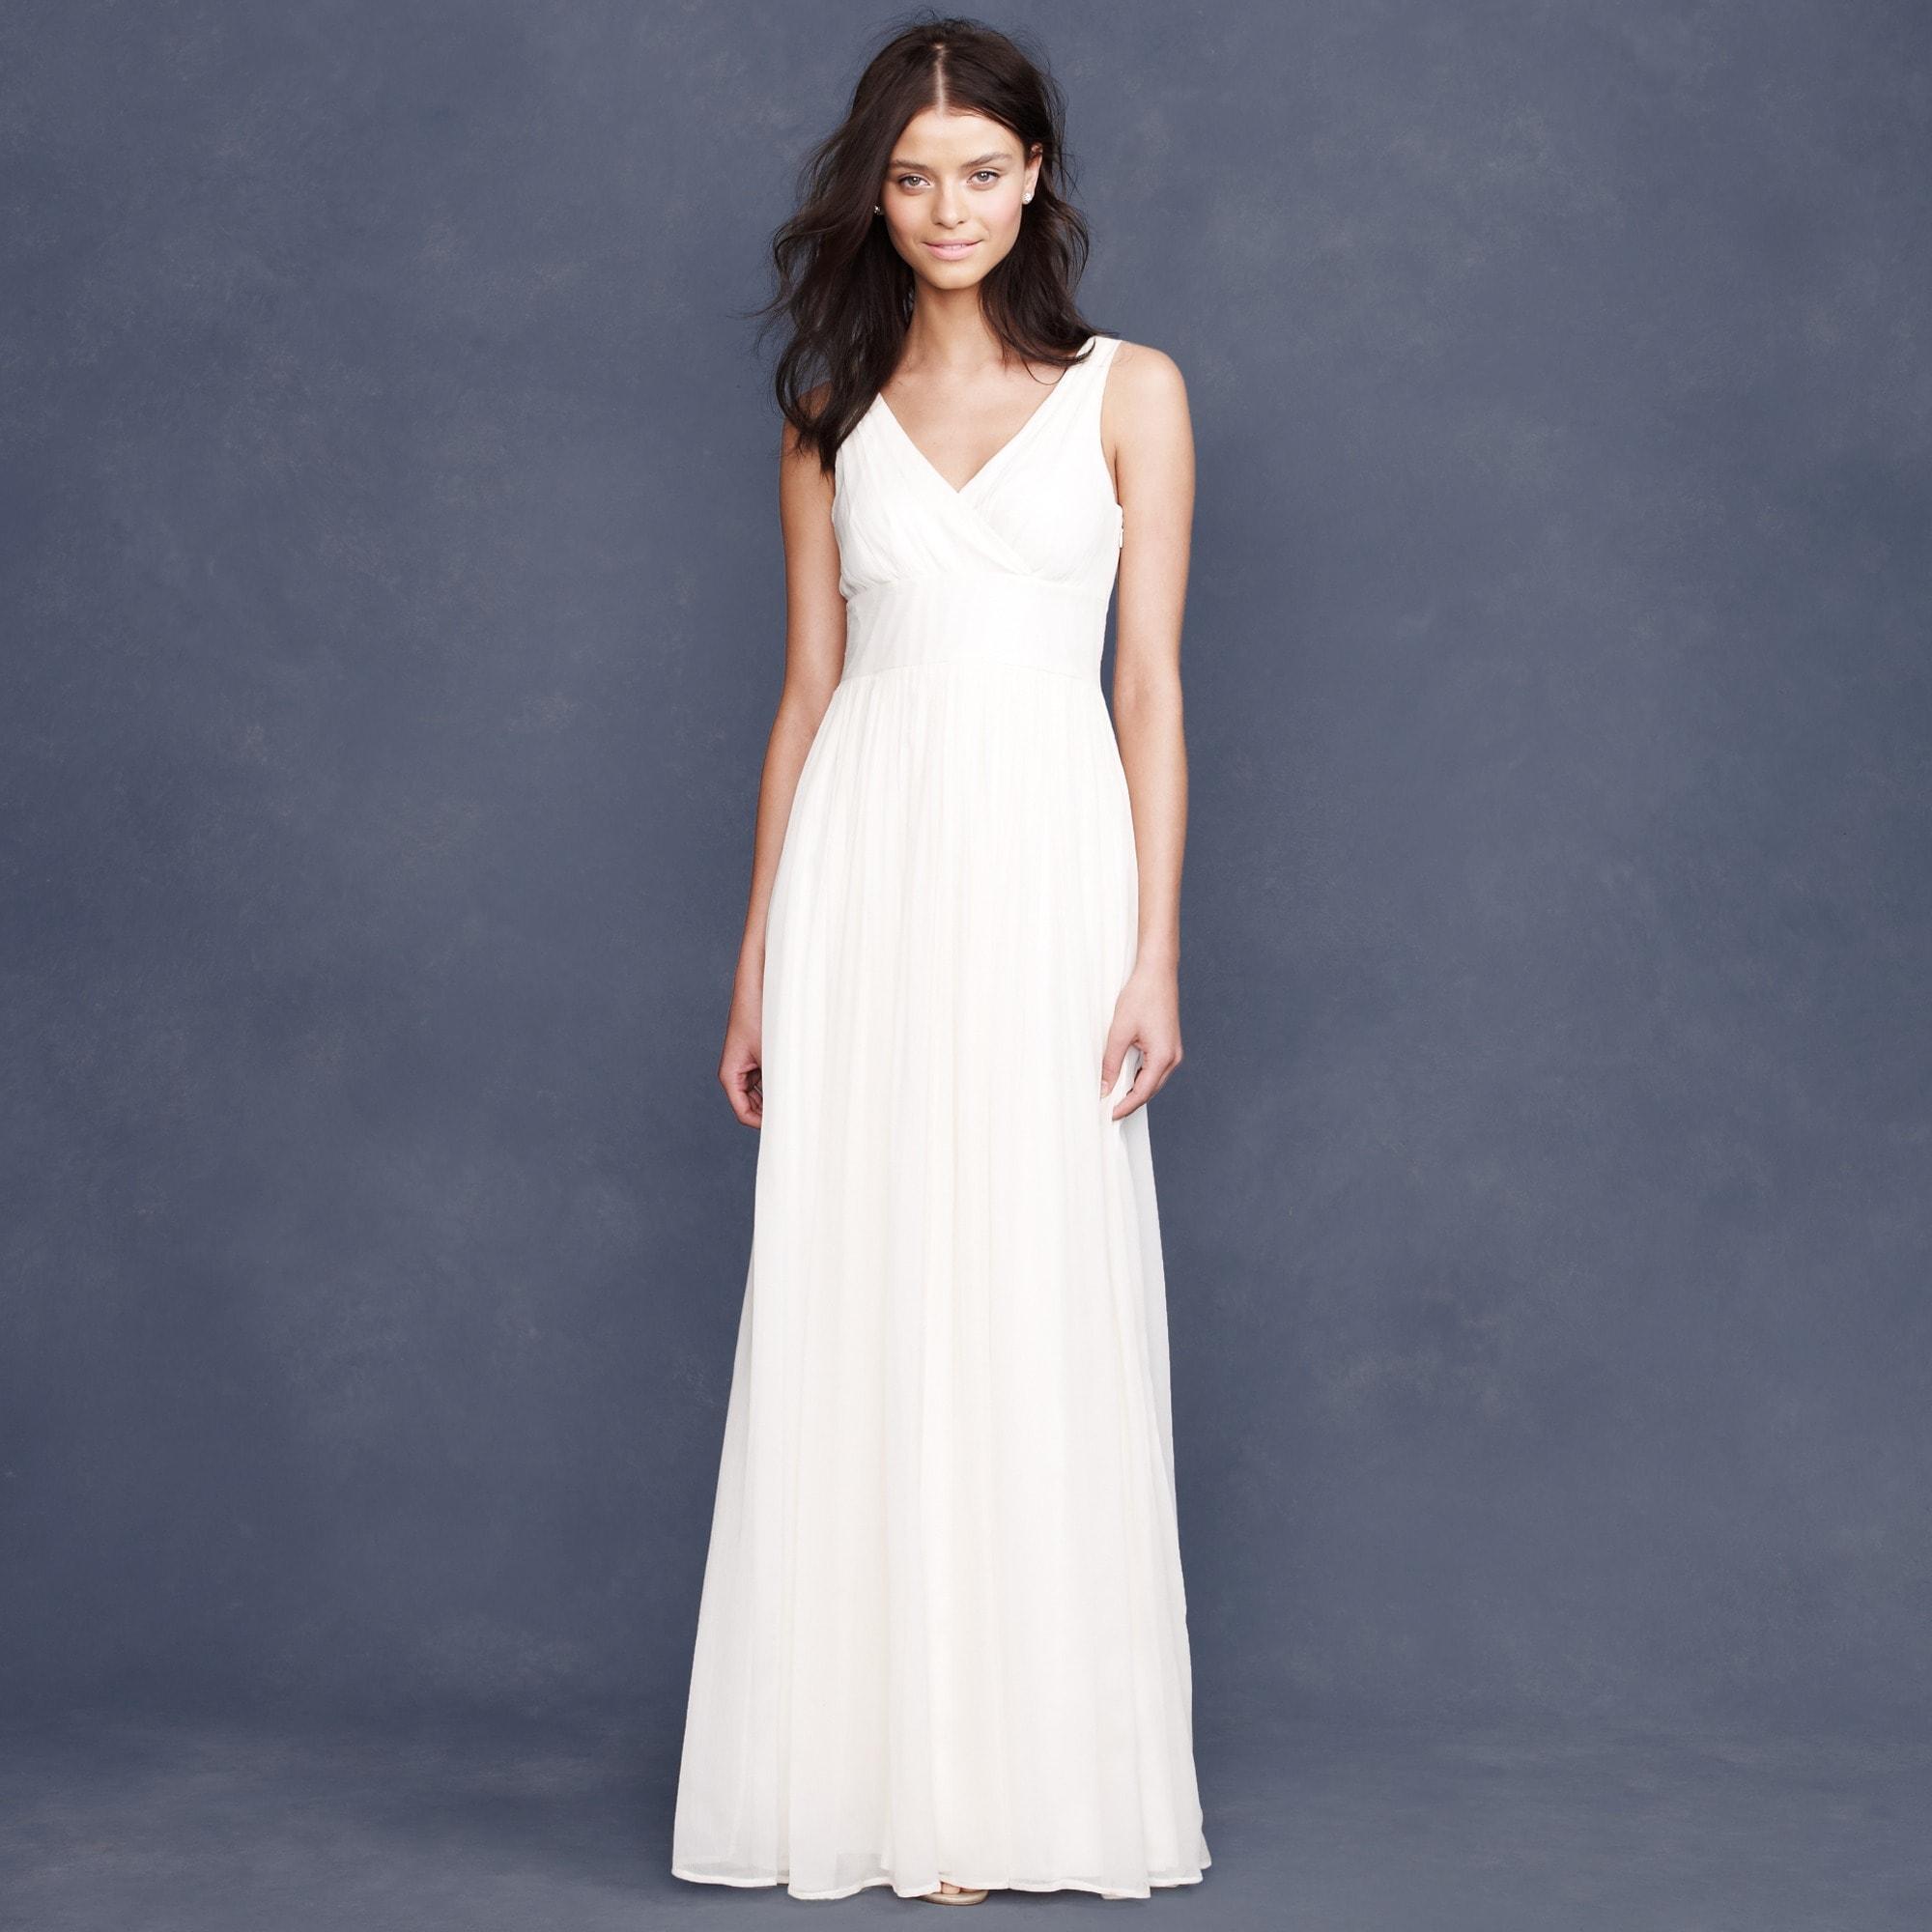 sophia gown in silk chiffon : women dresses & jumpsuits